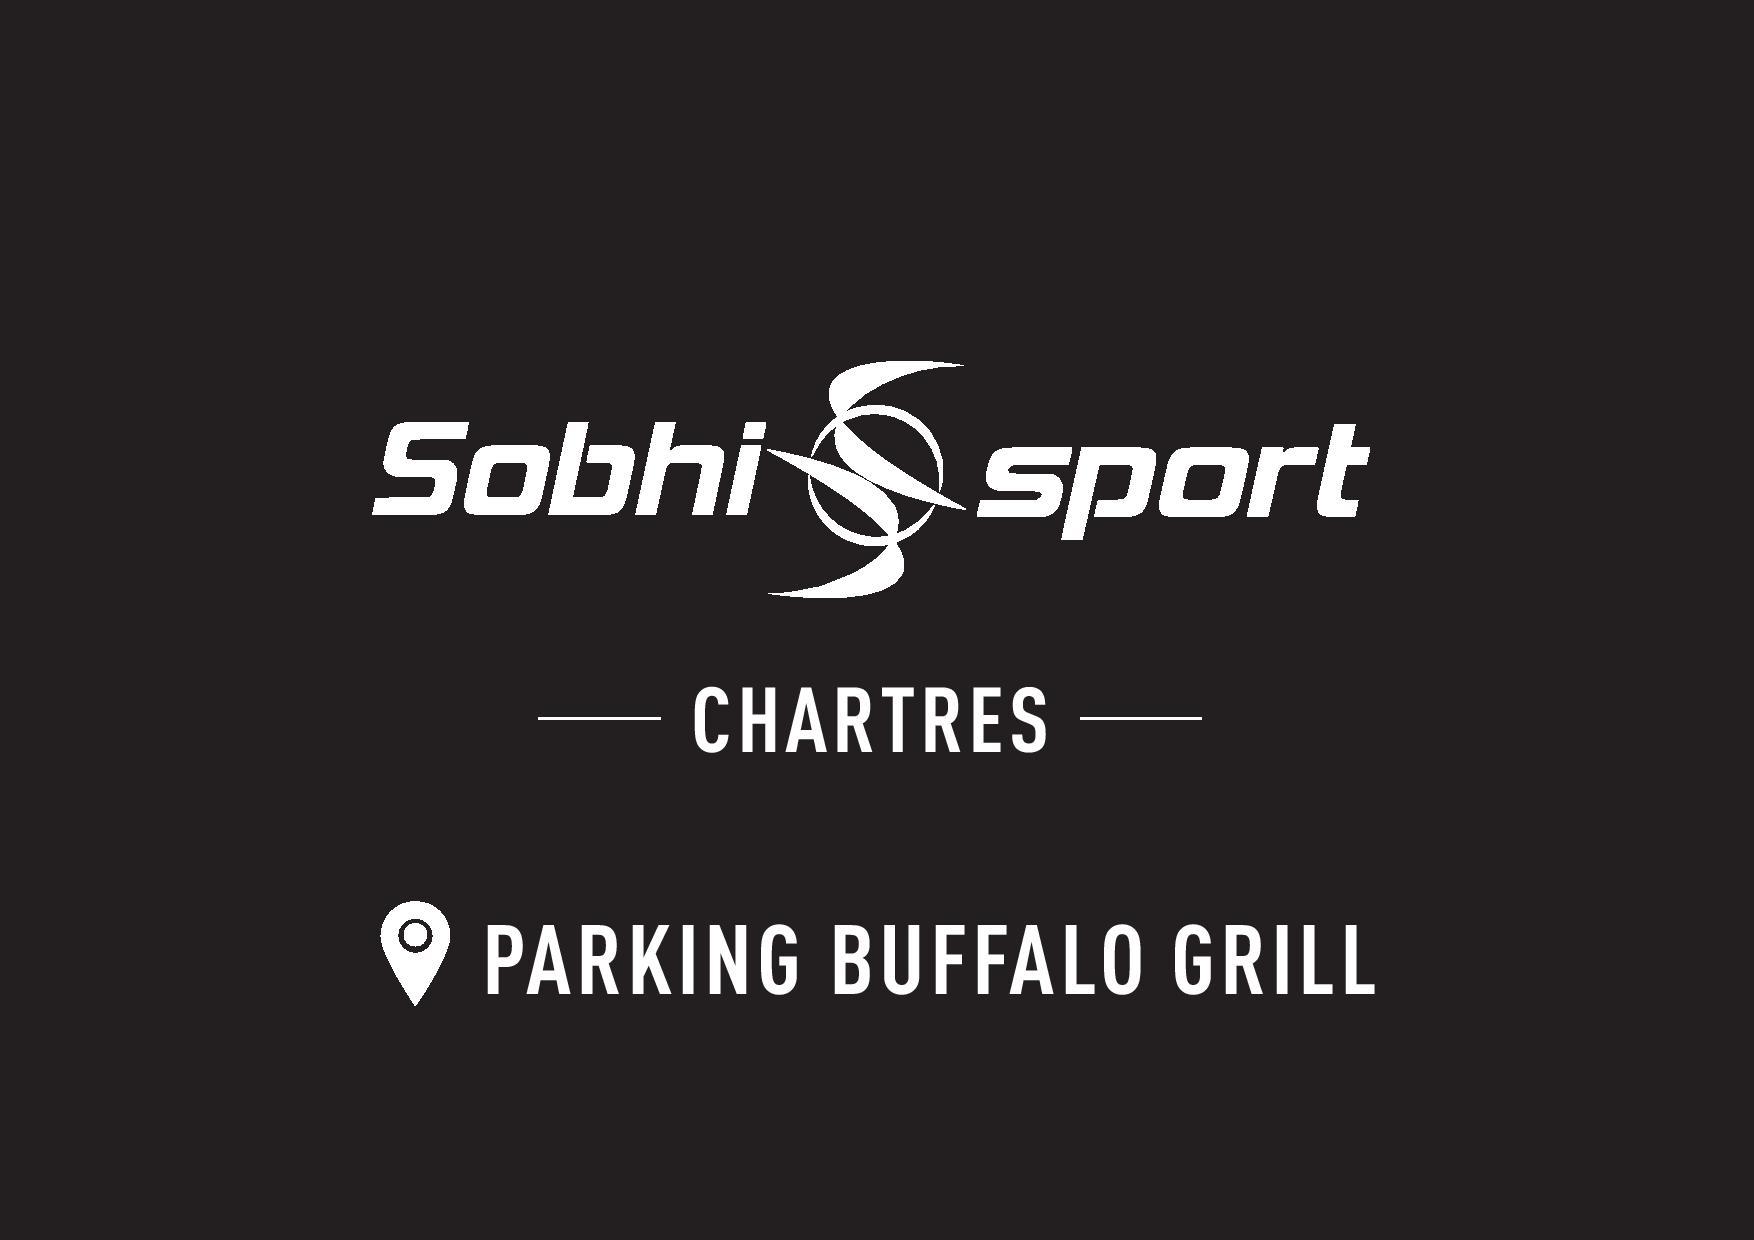 logo_sobhisport_chartres  _1_.jpg